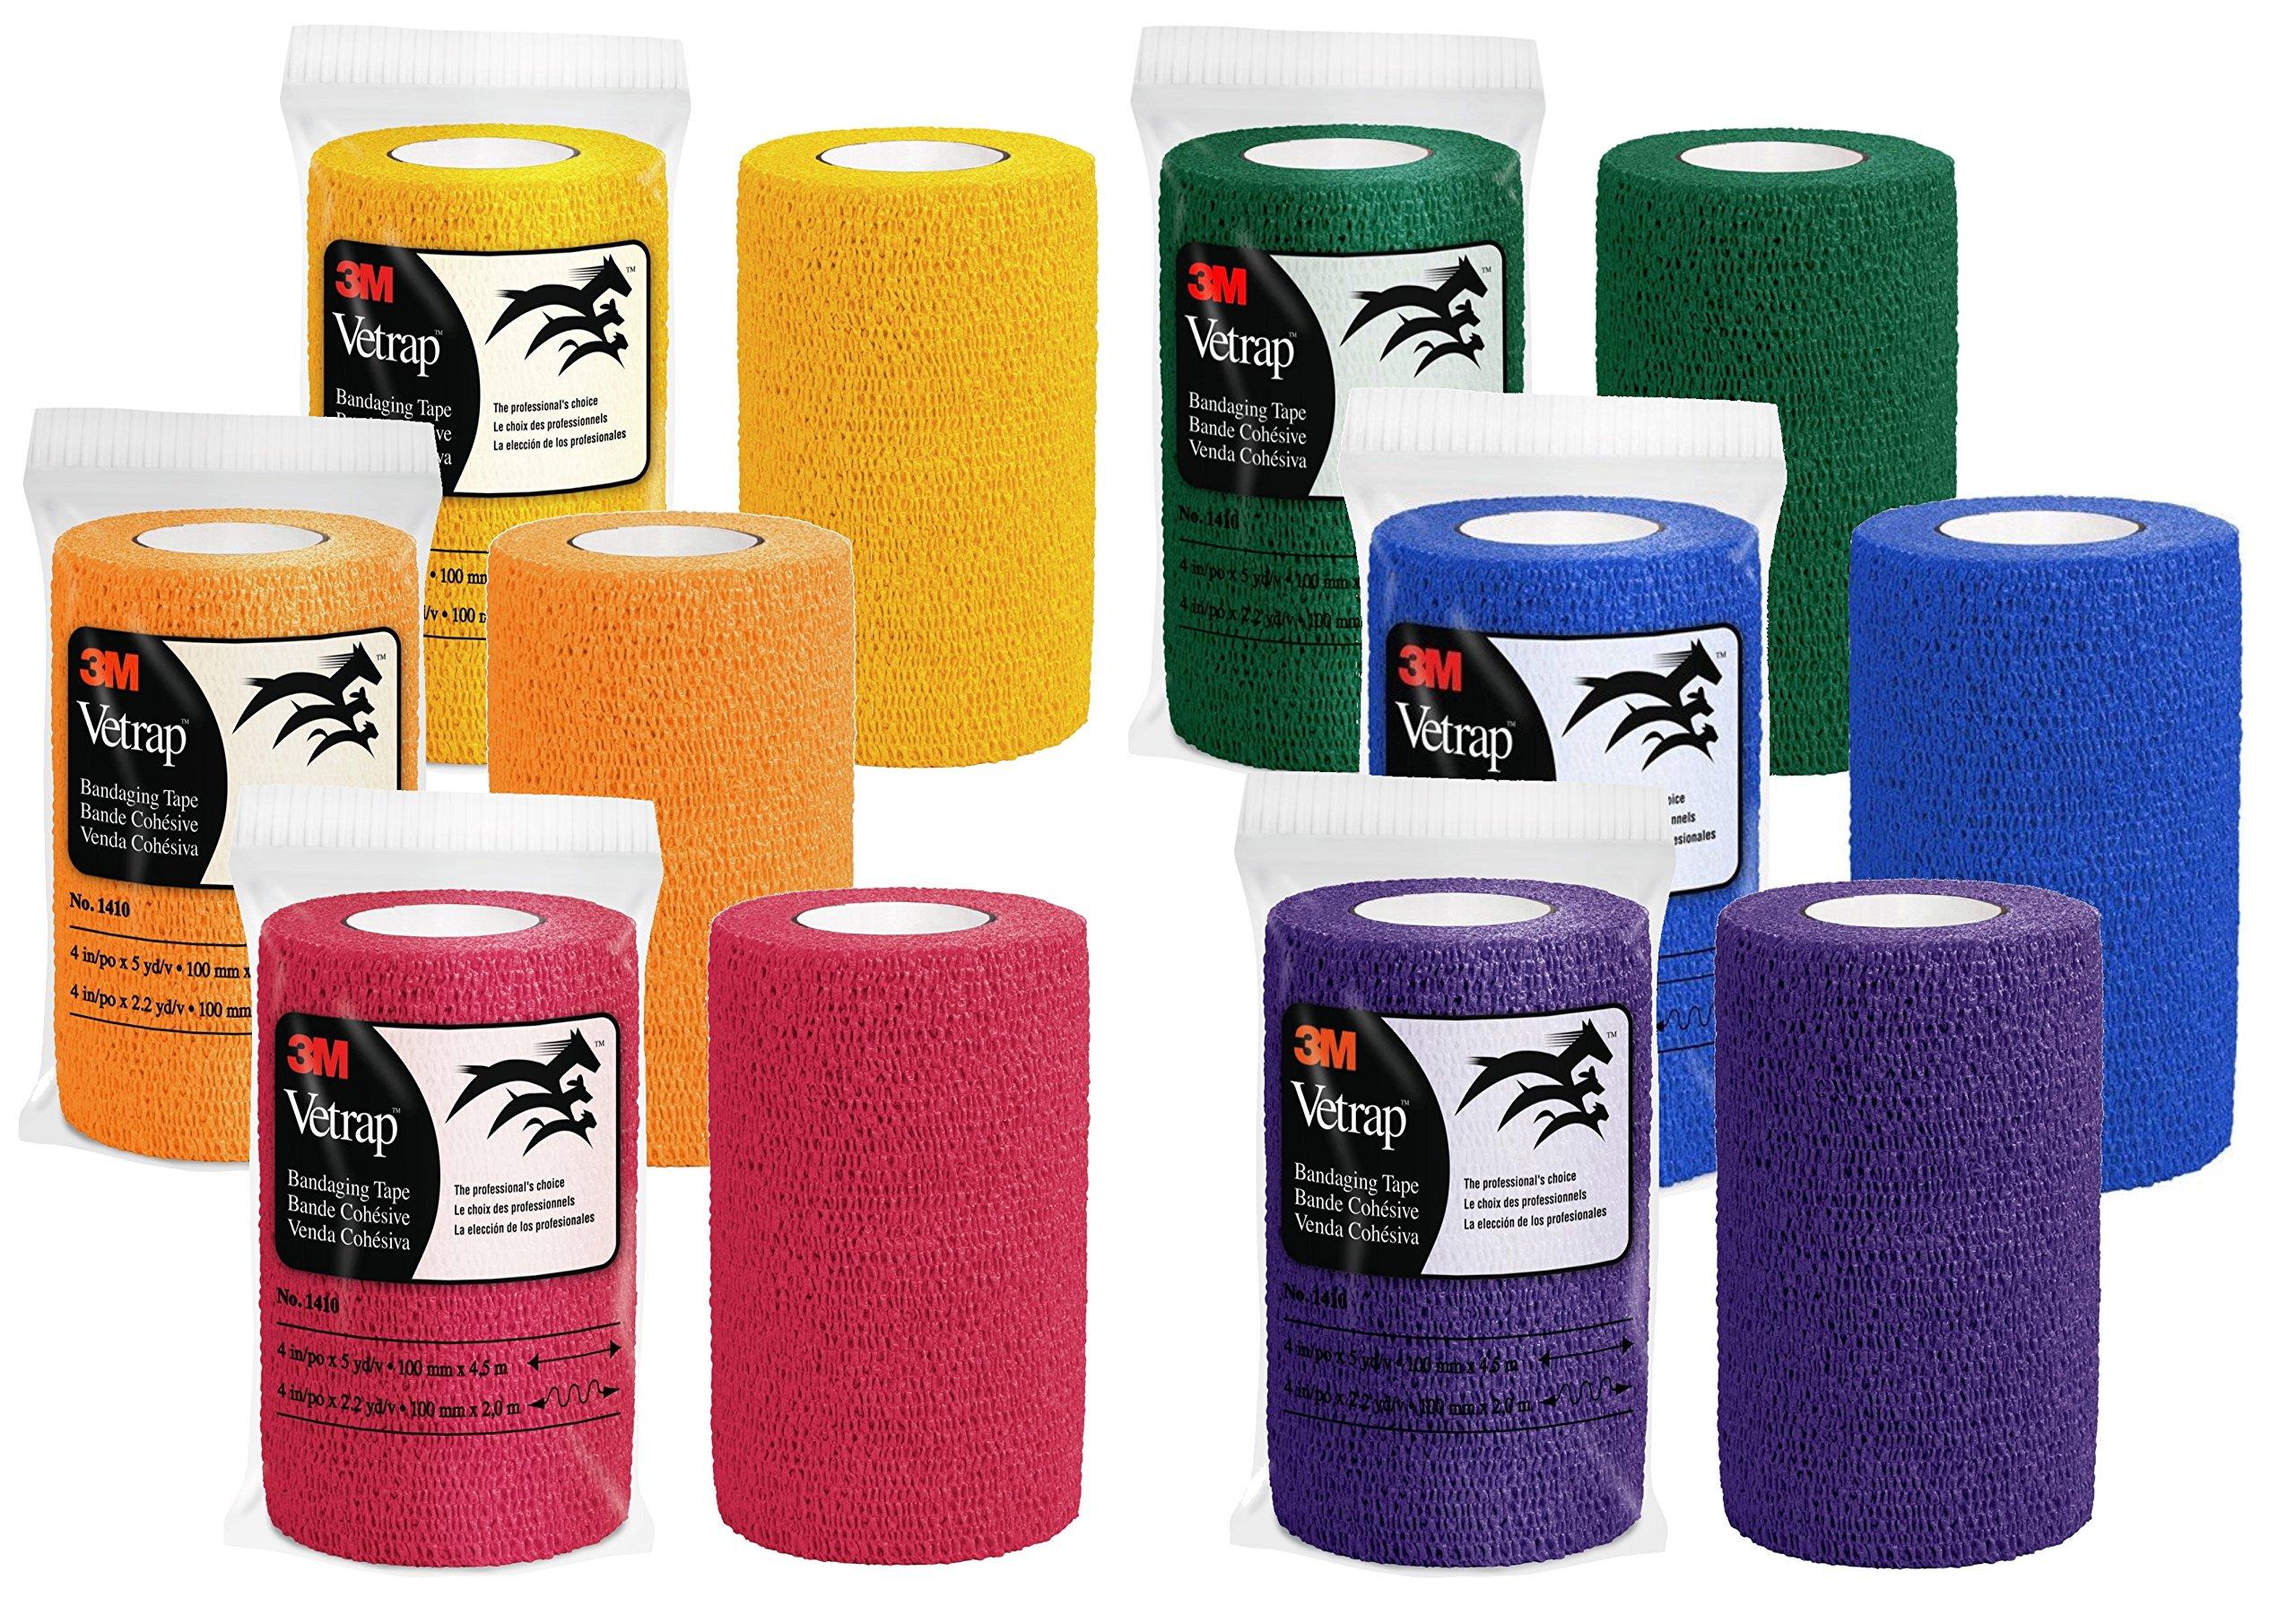 3M Vetrap 4'' Bandaging Tape 4''x 5 Yards, Rainbow Colors (Rainbow 24-Pack)